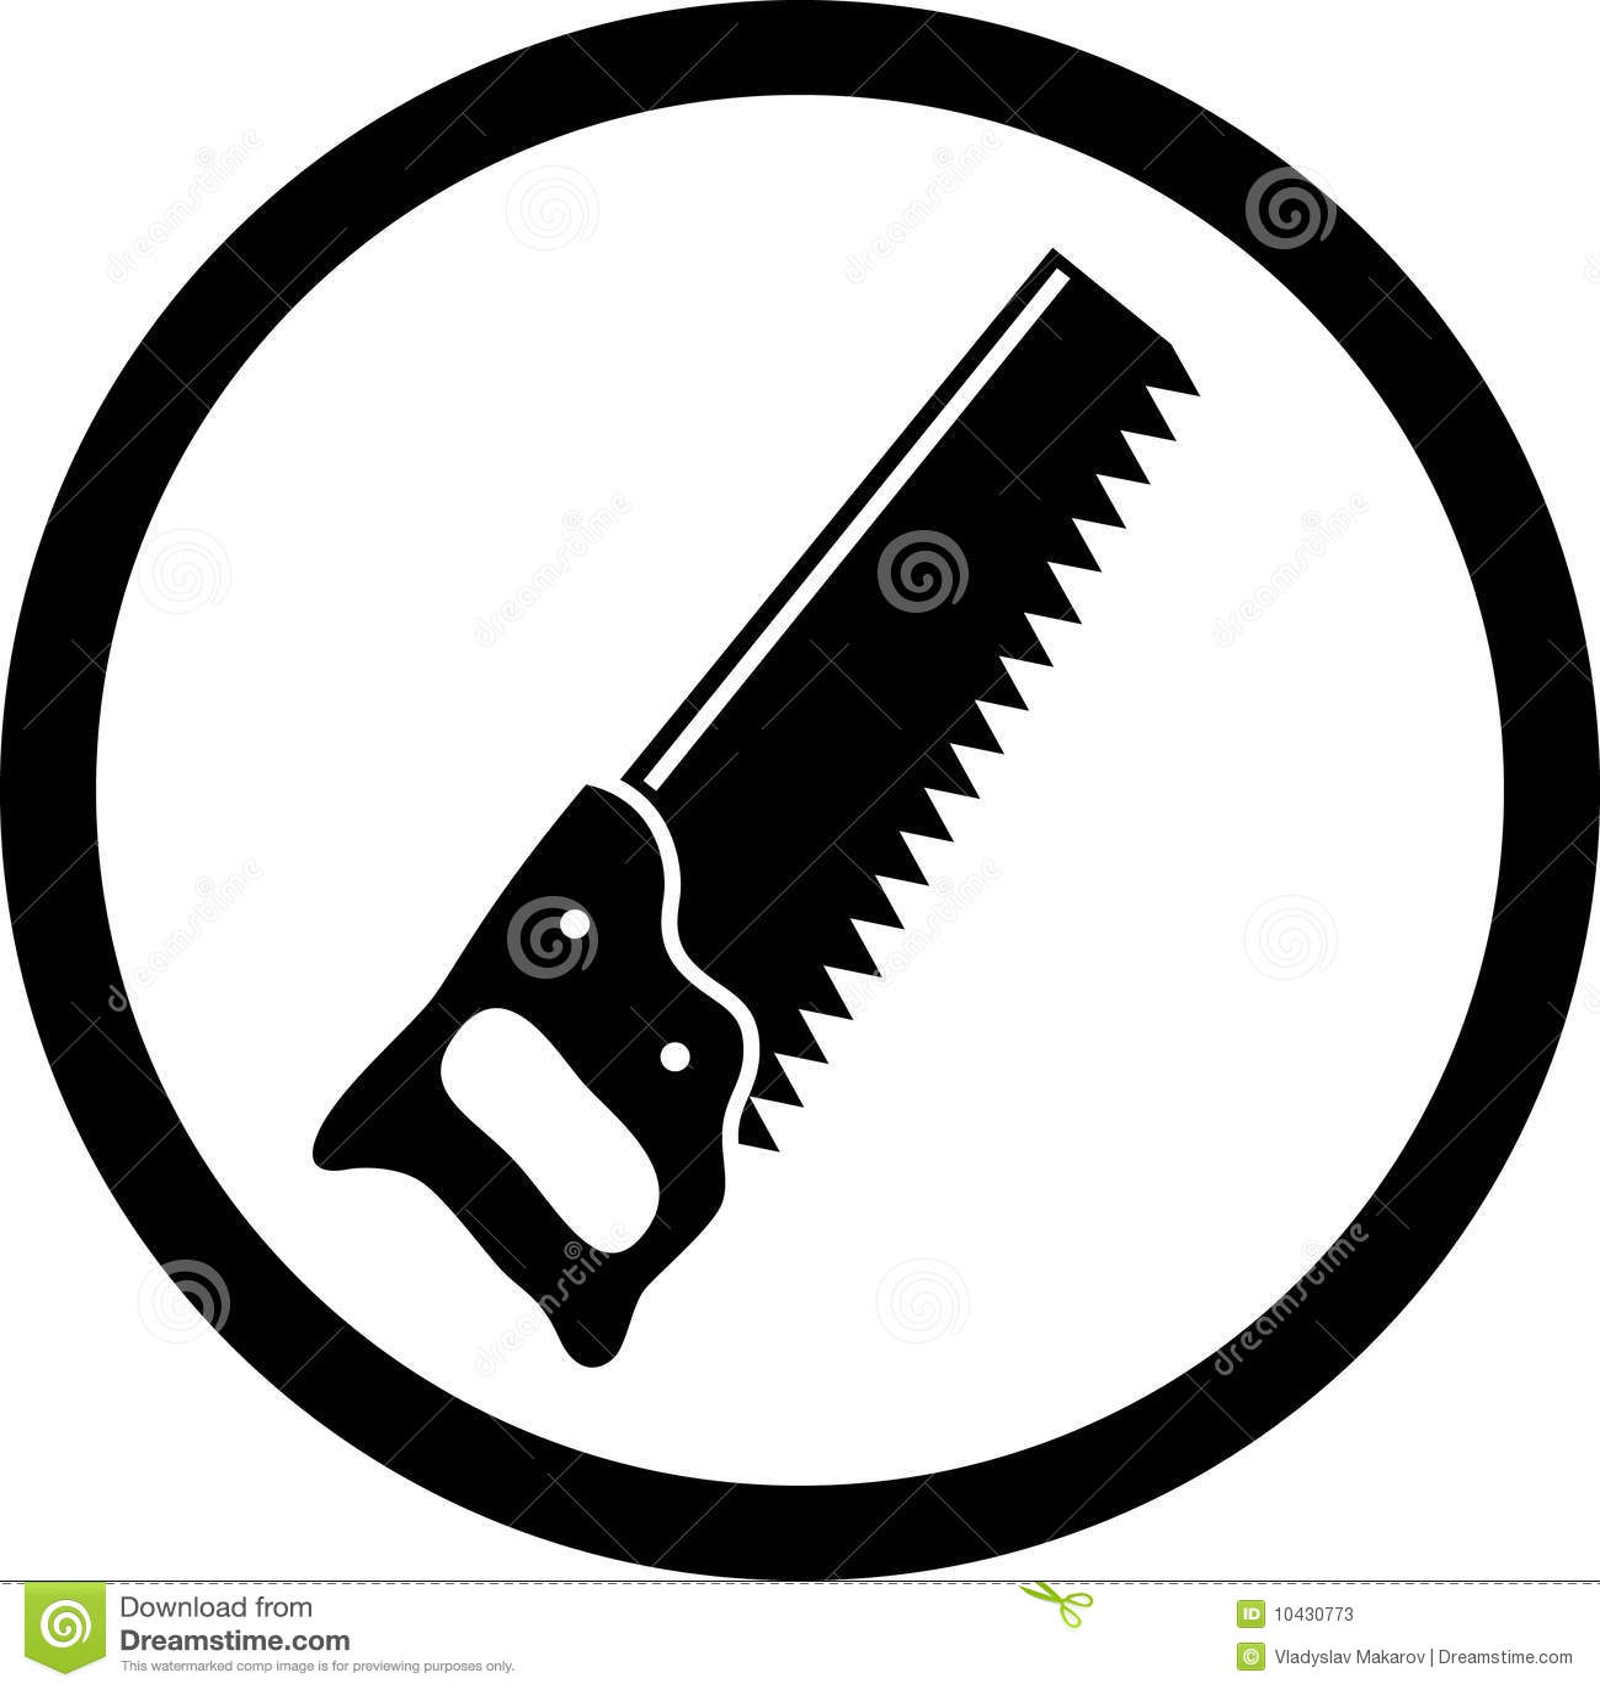 Hand saw stock vector. Illustration of line, design ...